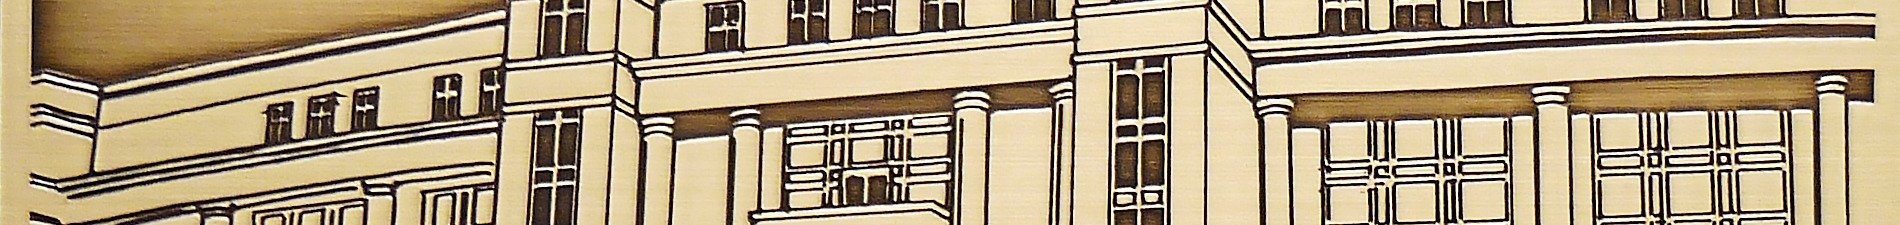 Header image closeup of brass Lake Sheldon University plaque